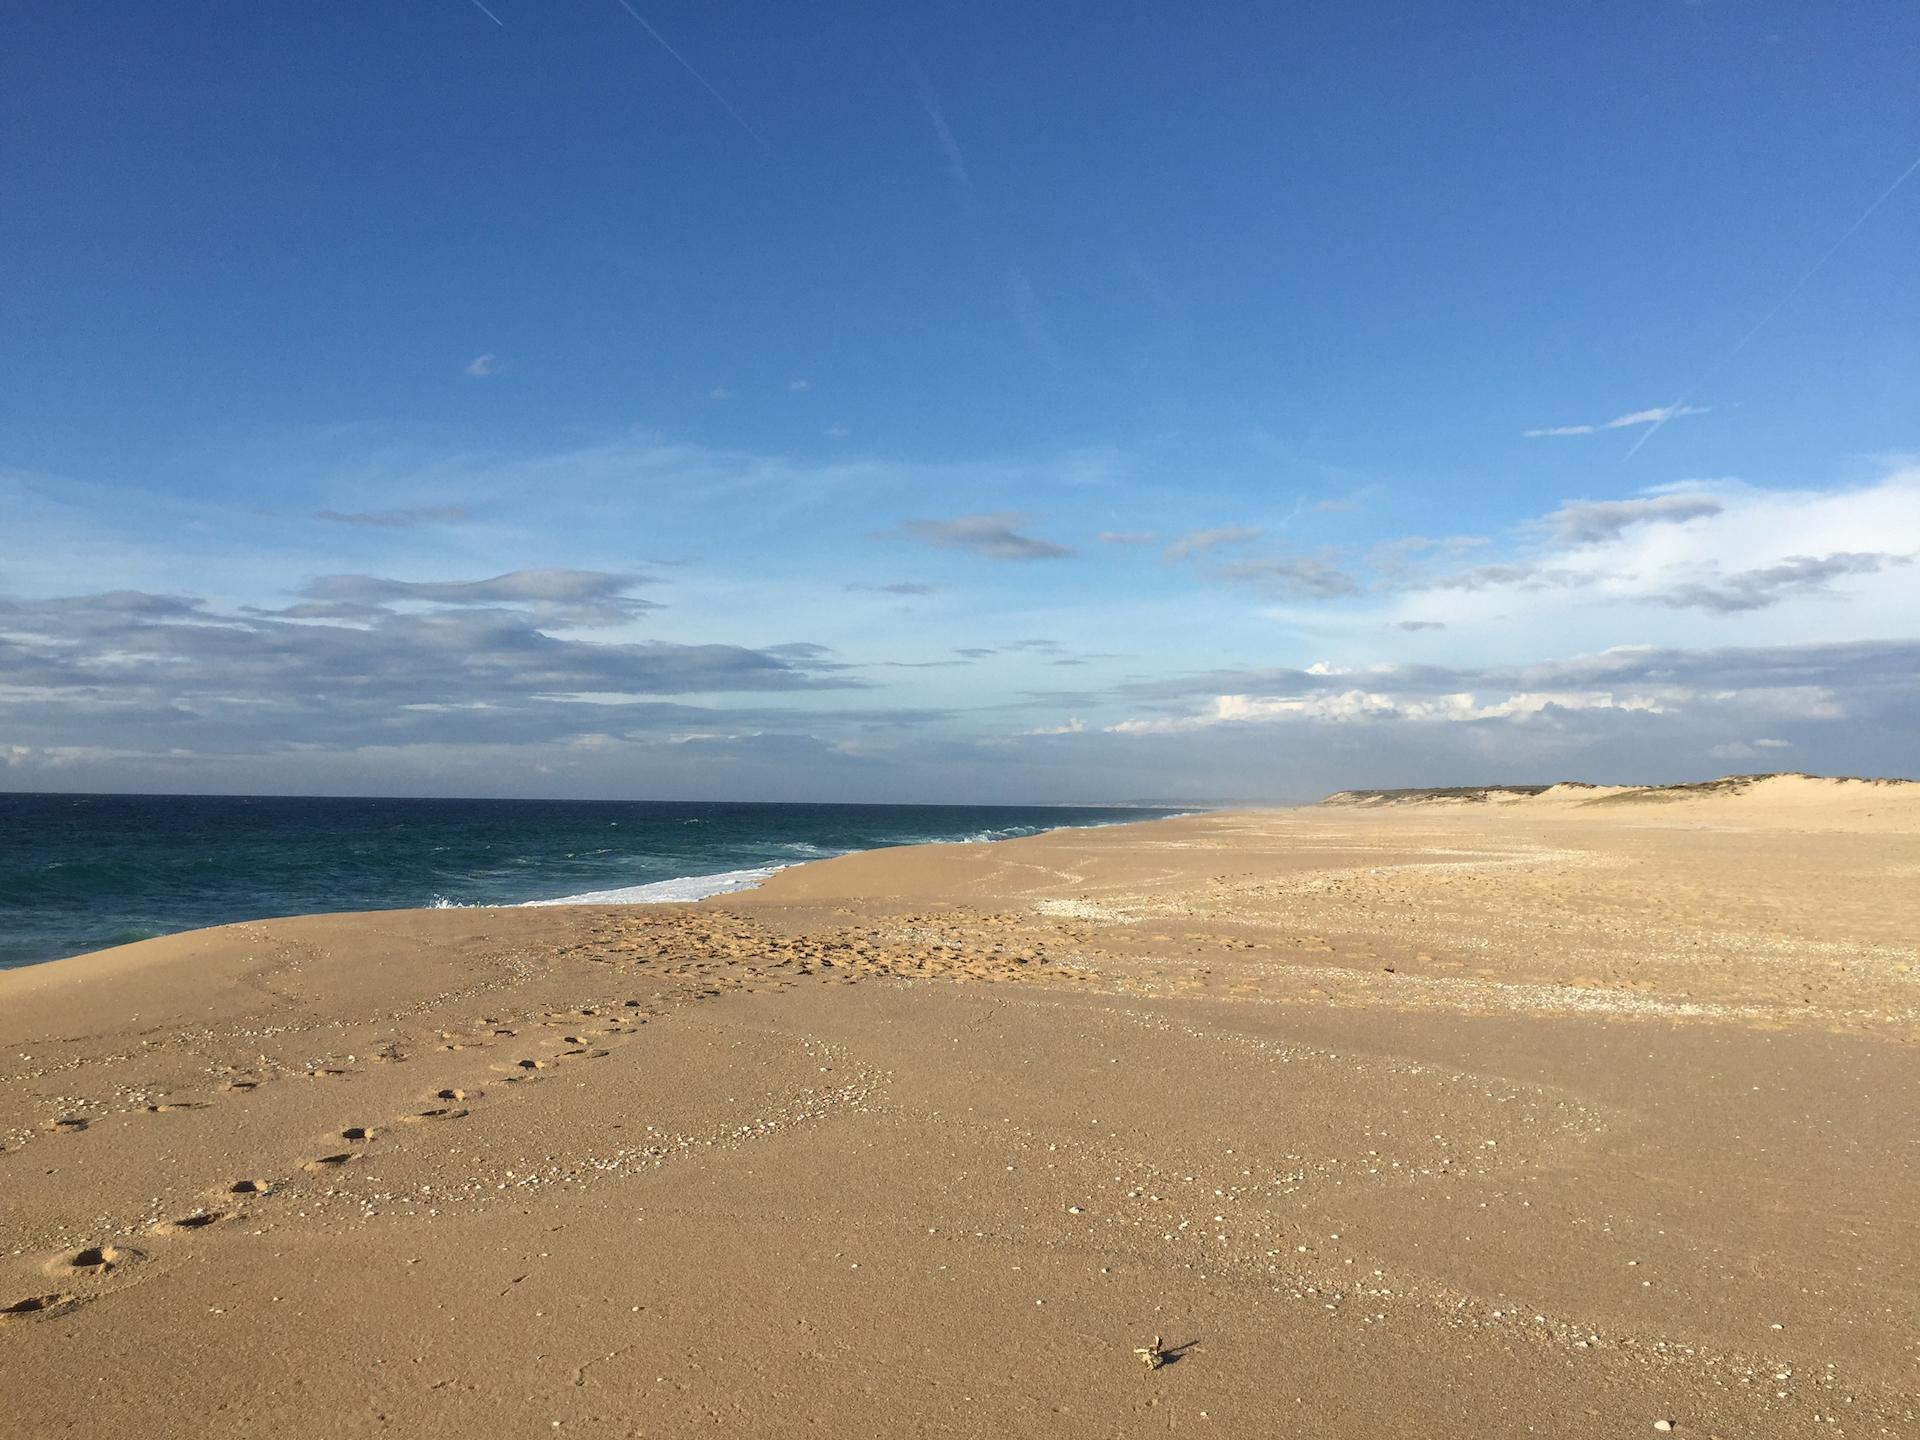 Prázdné portugalské pláže v listopadu